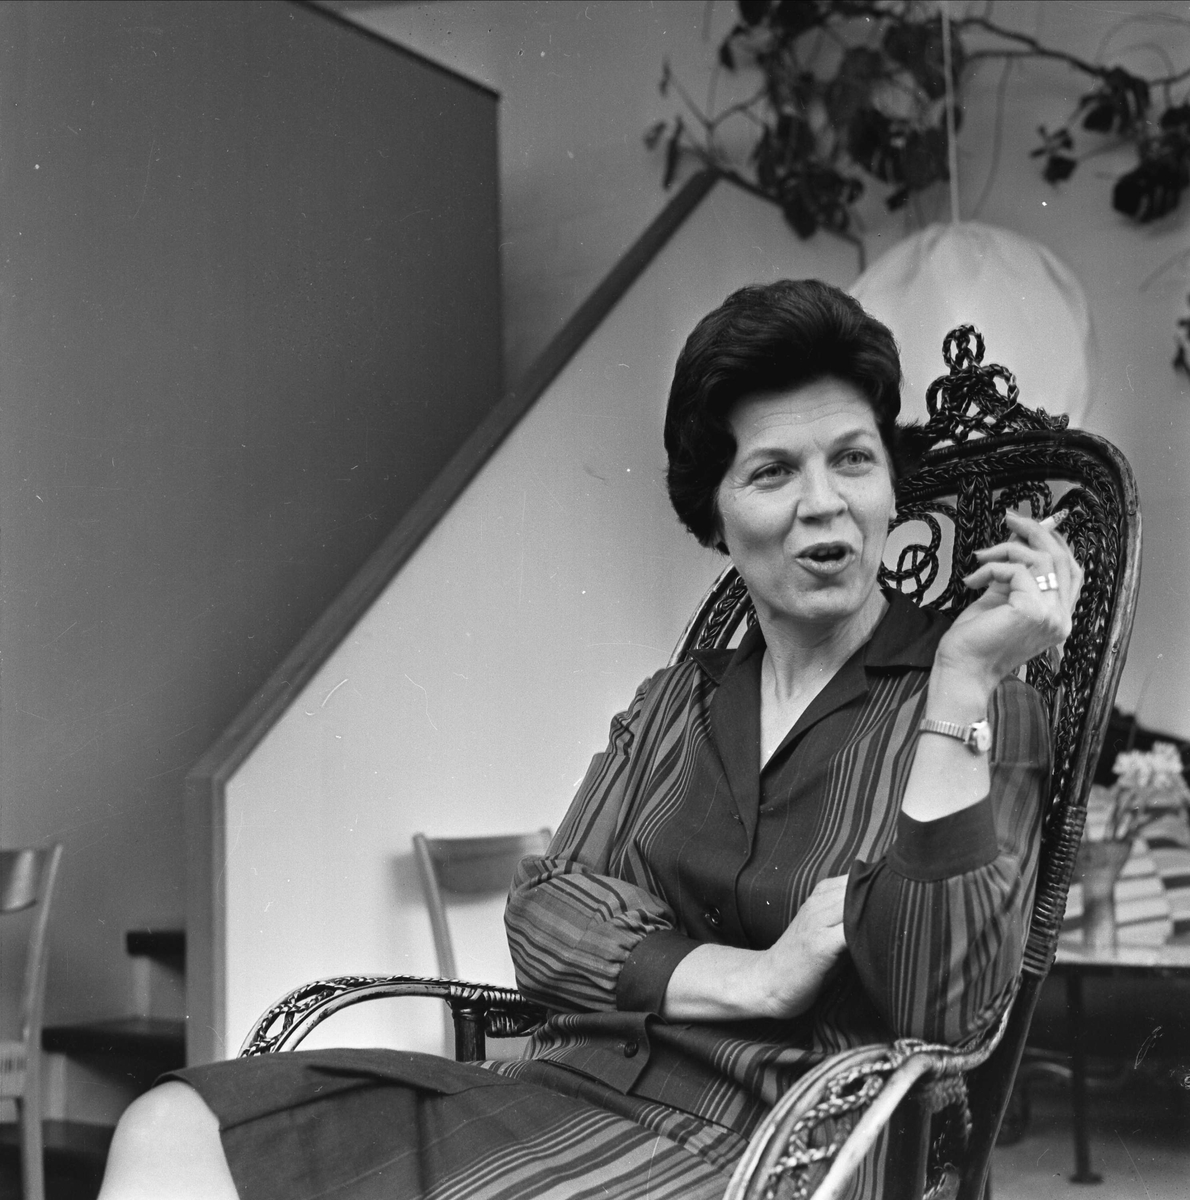 Keramikern Ingrid Atterberg, Uppsala 1961